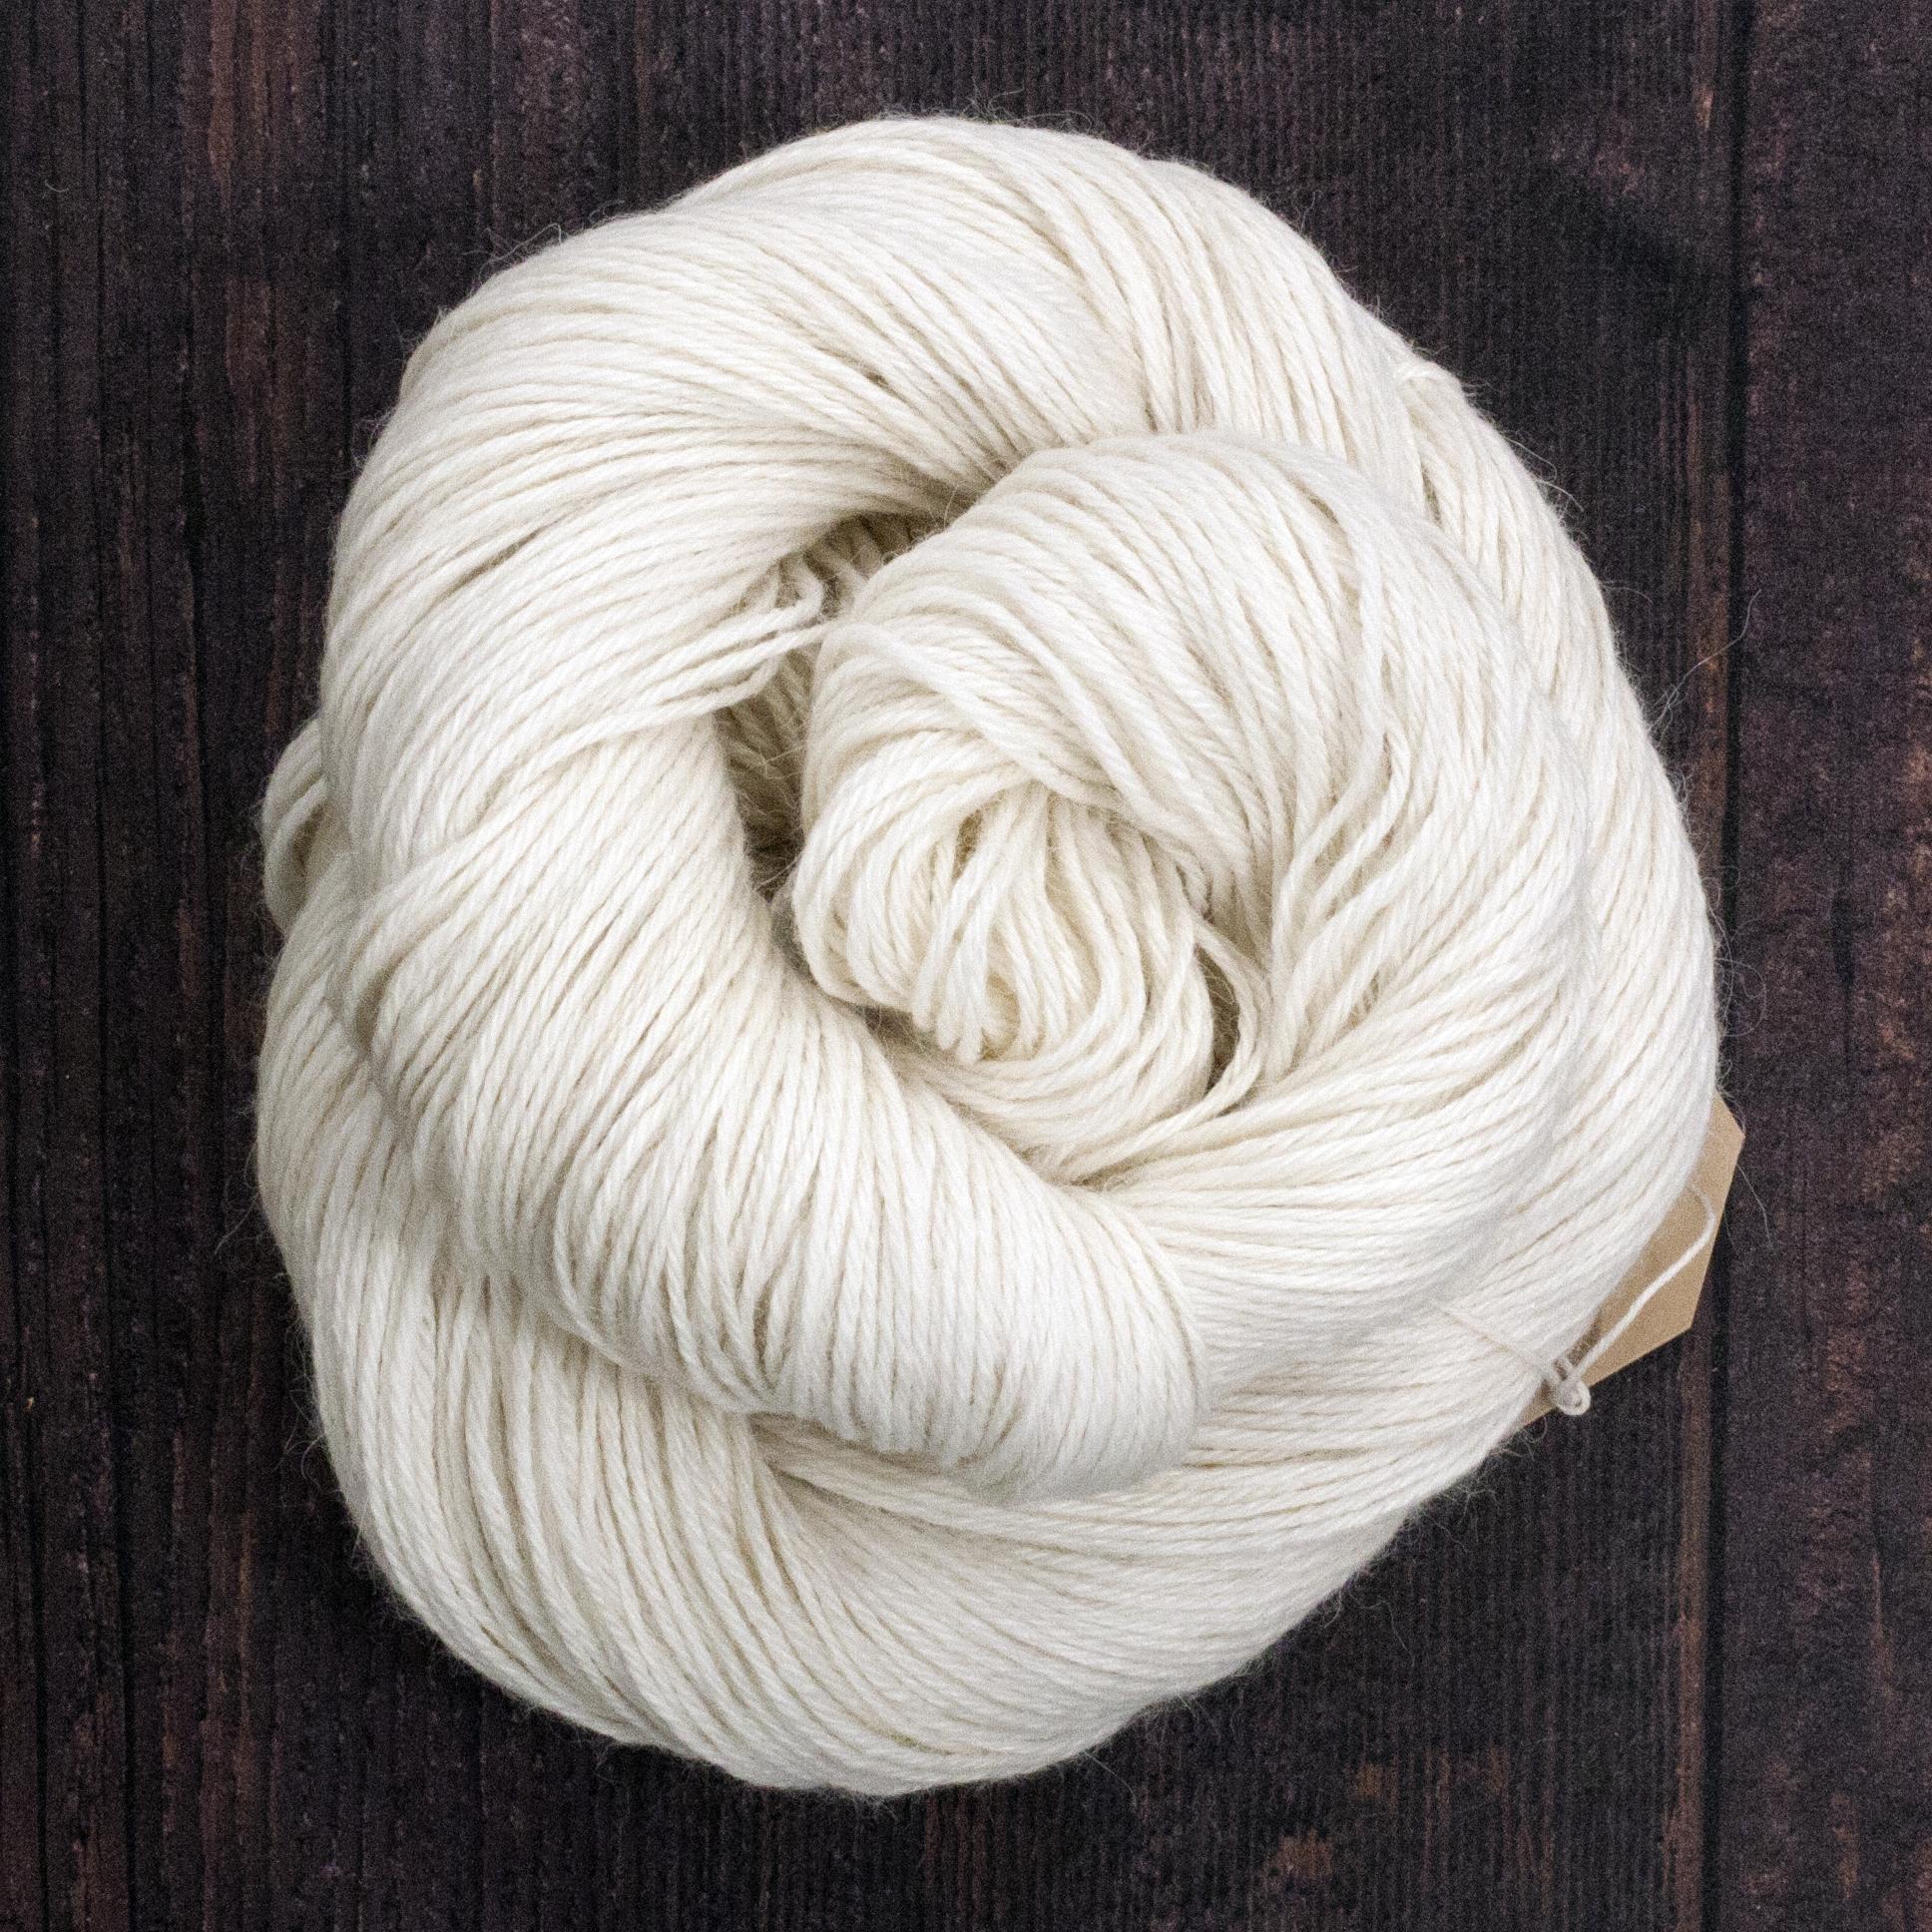 Type 49109   Alpaca Silk Sport 262  80% Superfine Alpaca 20% Silk  100g Hanks  262m per 100g 4/10.5nm